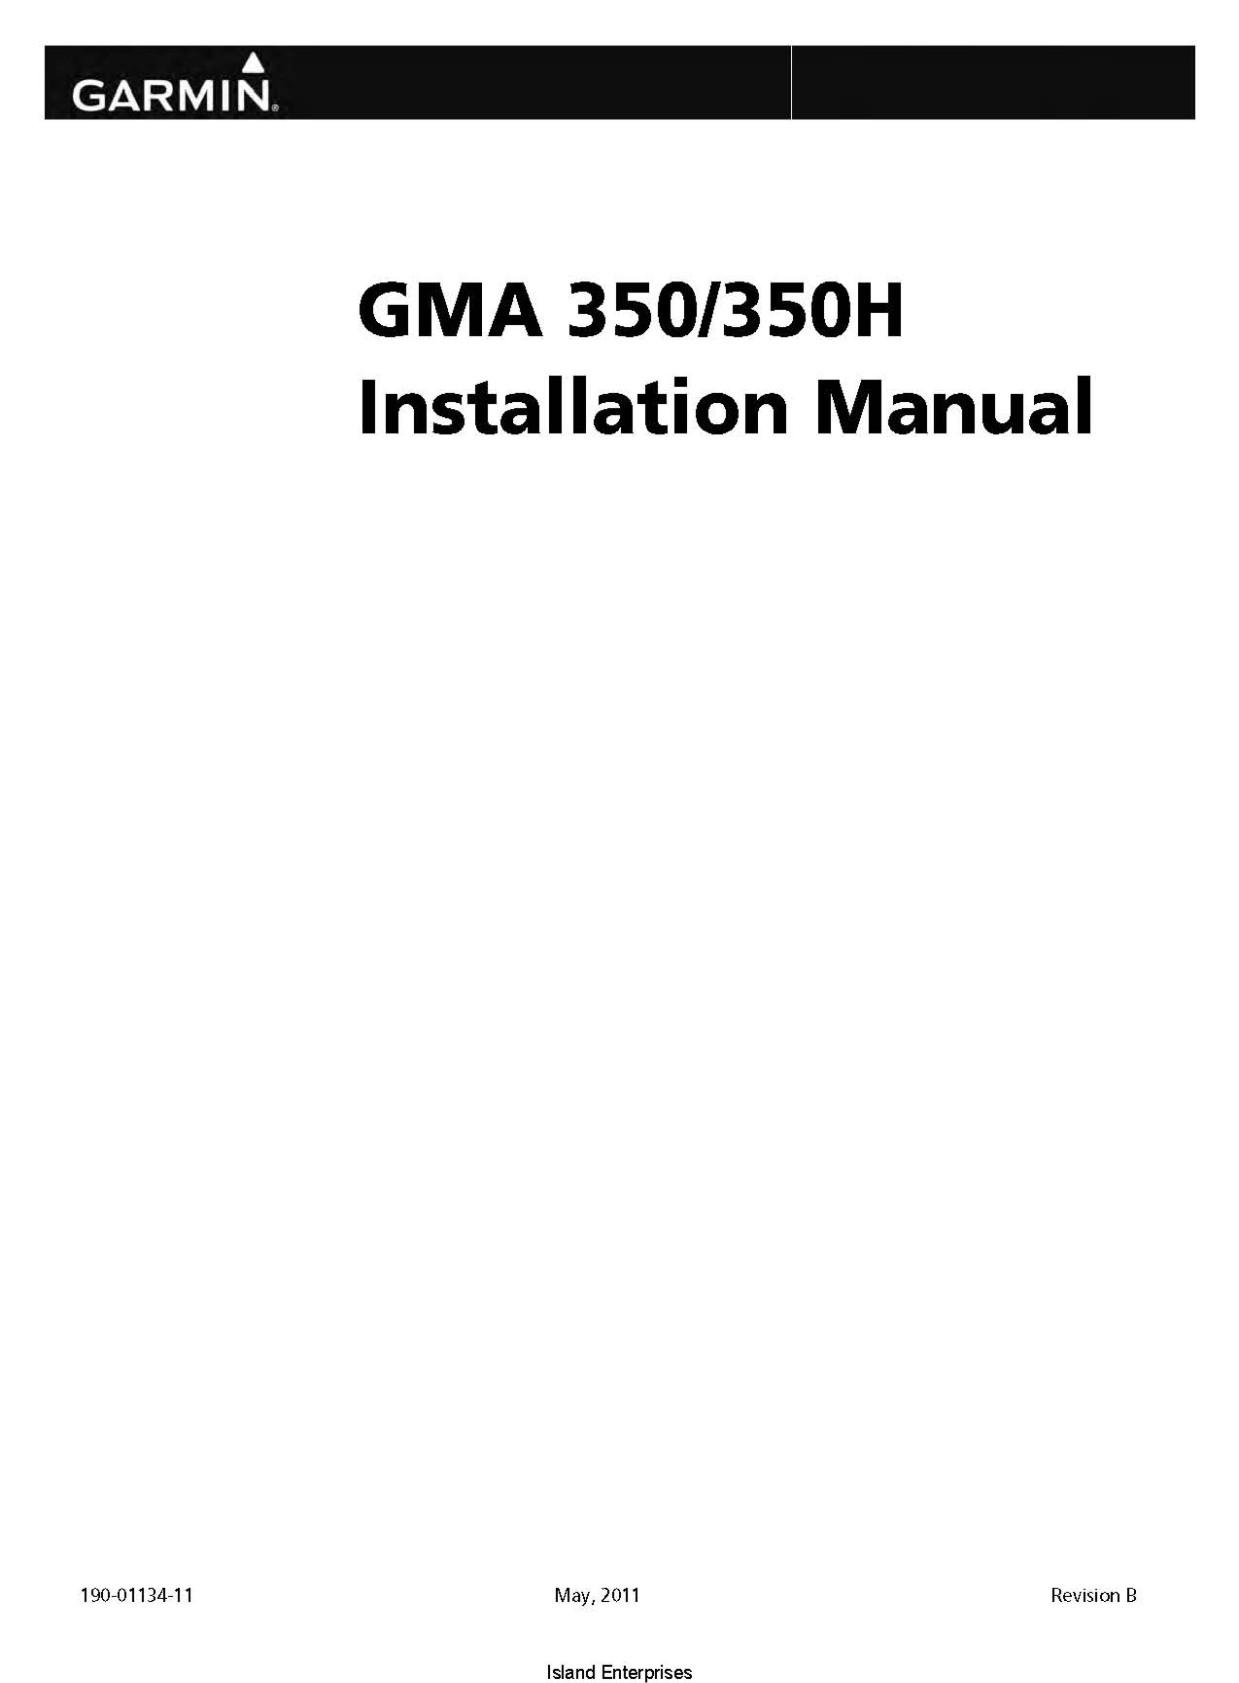 Garmin GMA 350/350H Installation Manual 190-01134-11